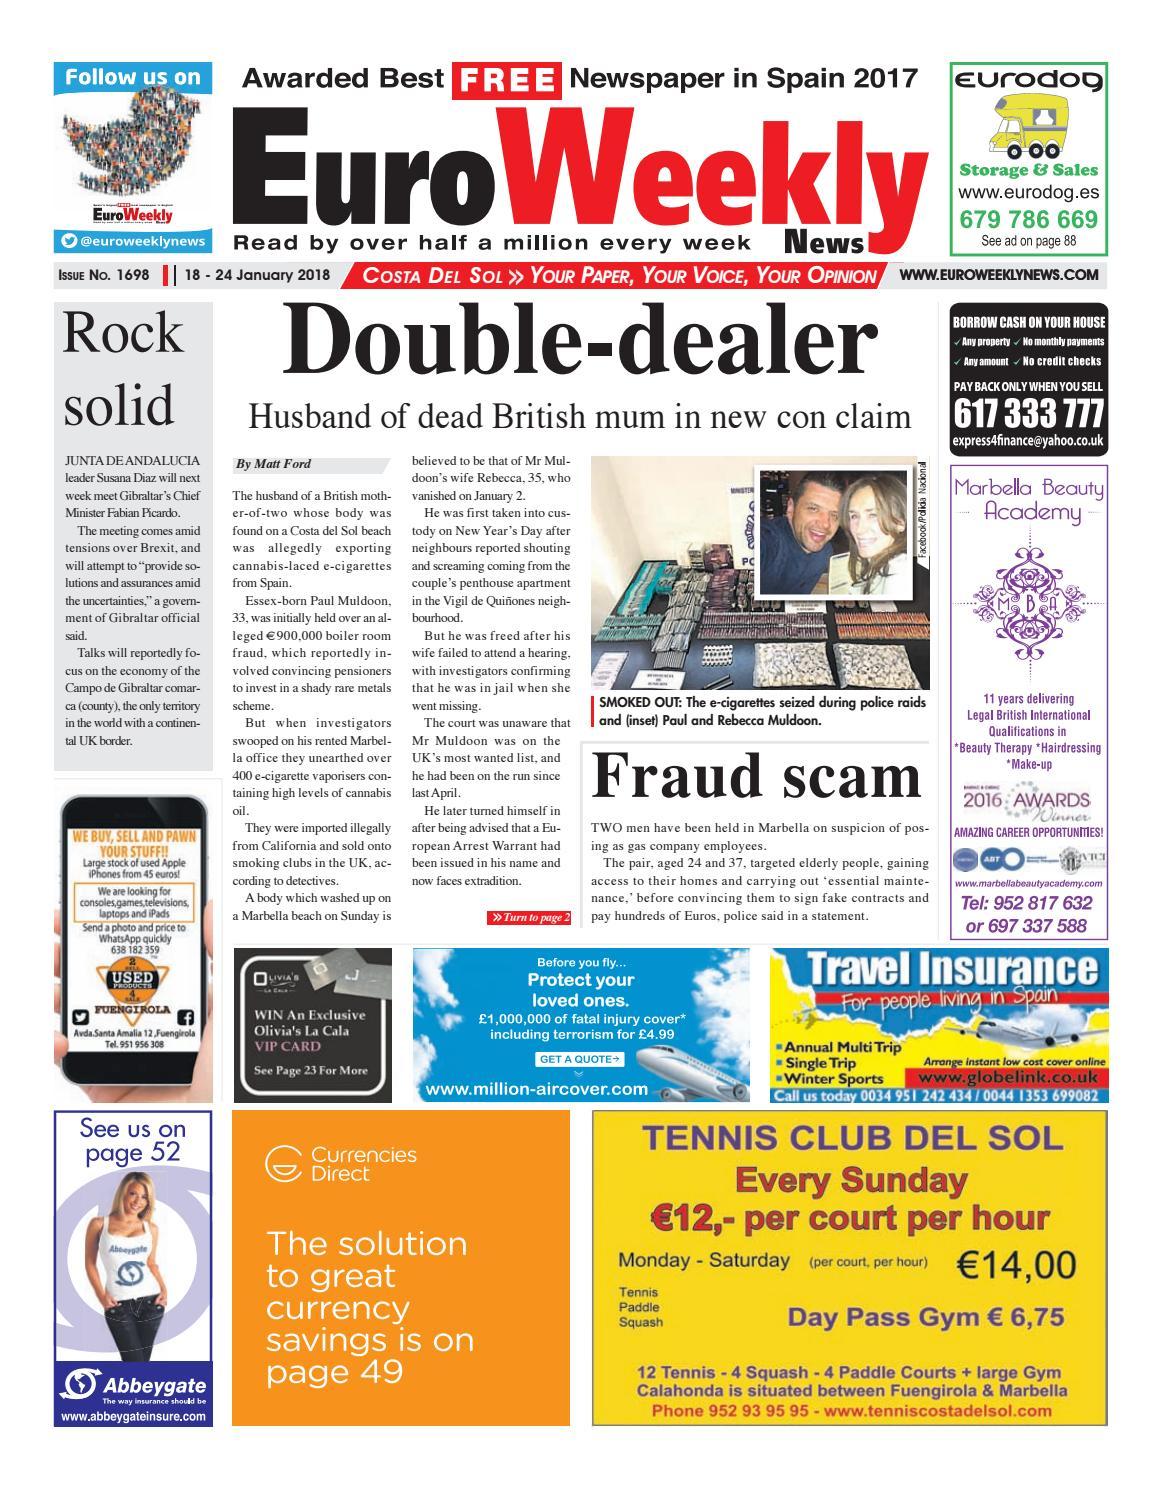 Euro weekly news costa del sol 18 24 jan 2018 issue 1698 by euro euro weekly news costa del sol 18 24 jan 2018 issue 1698 by euro weekly news media sa issuu fandeluxe Gallery